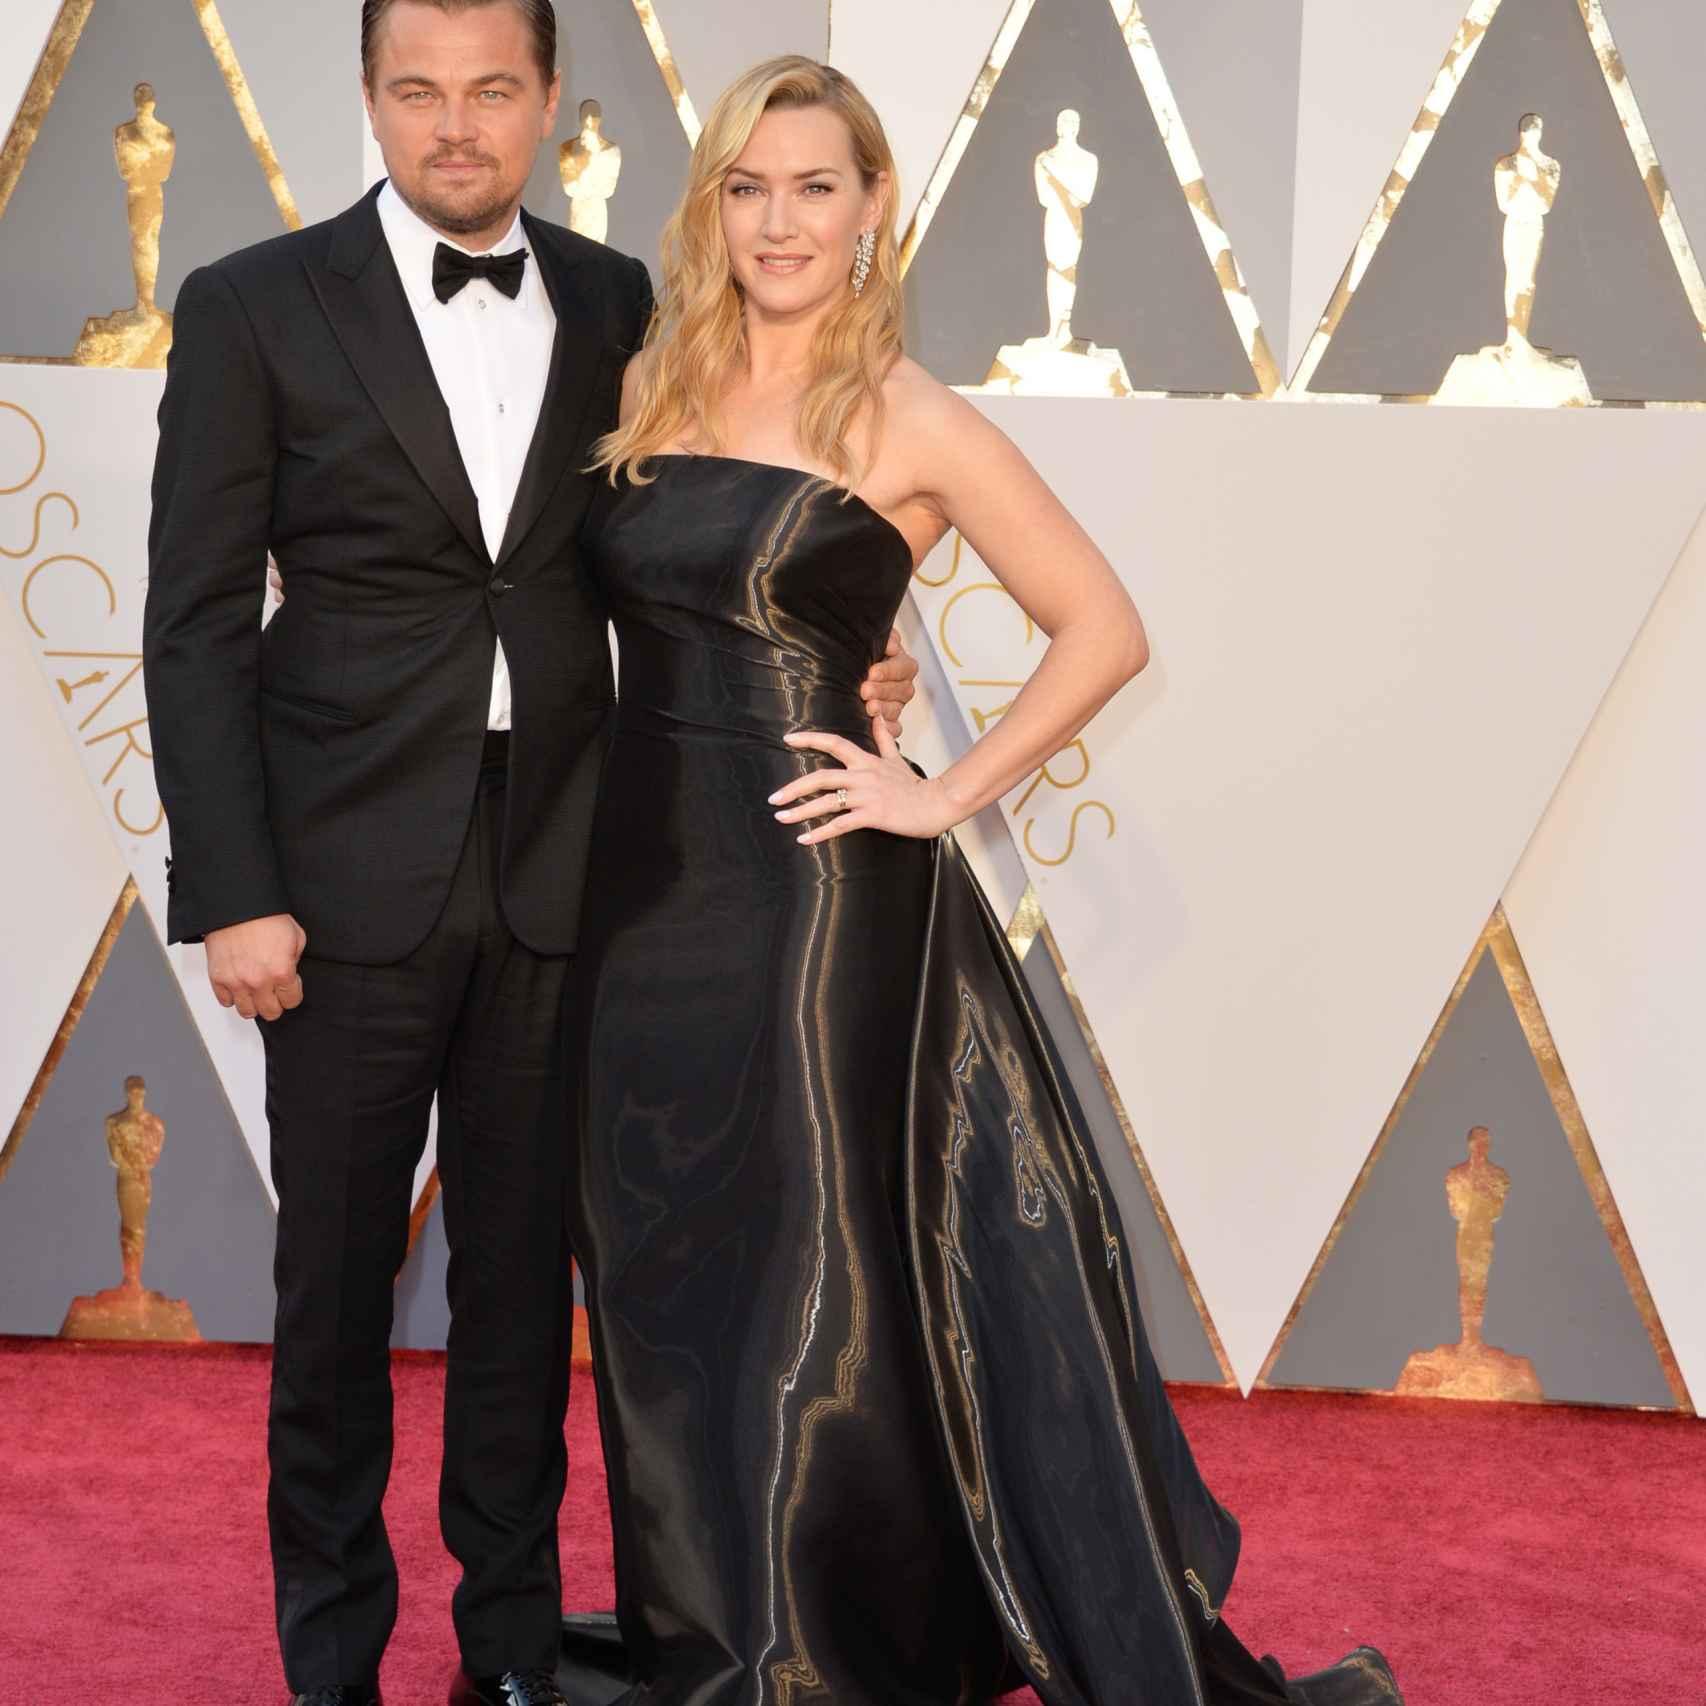 Kate Winslet de Ralph Lauren y Leonardo DiCaprio de Armani